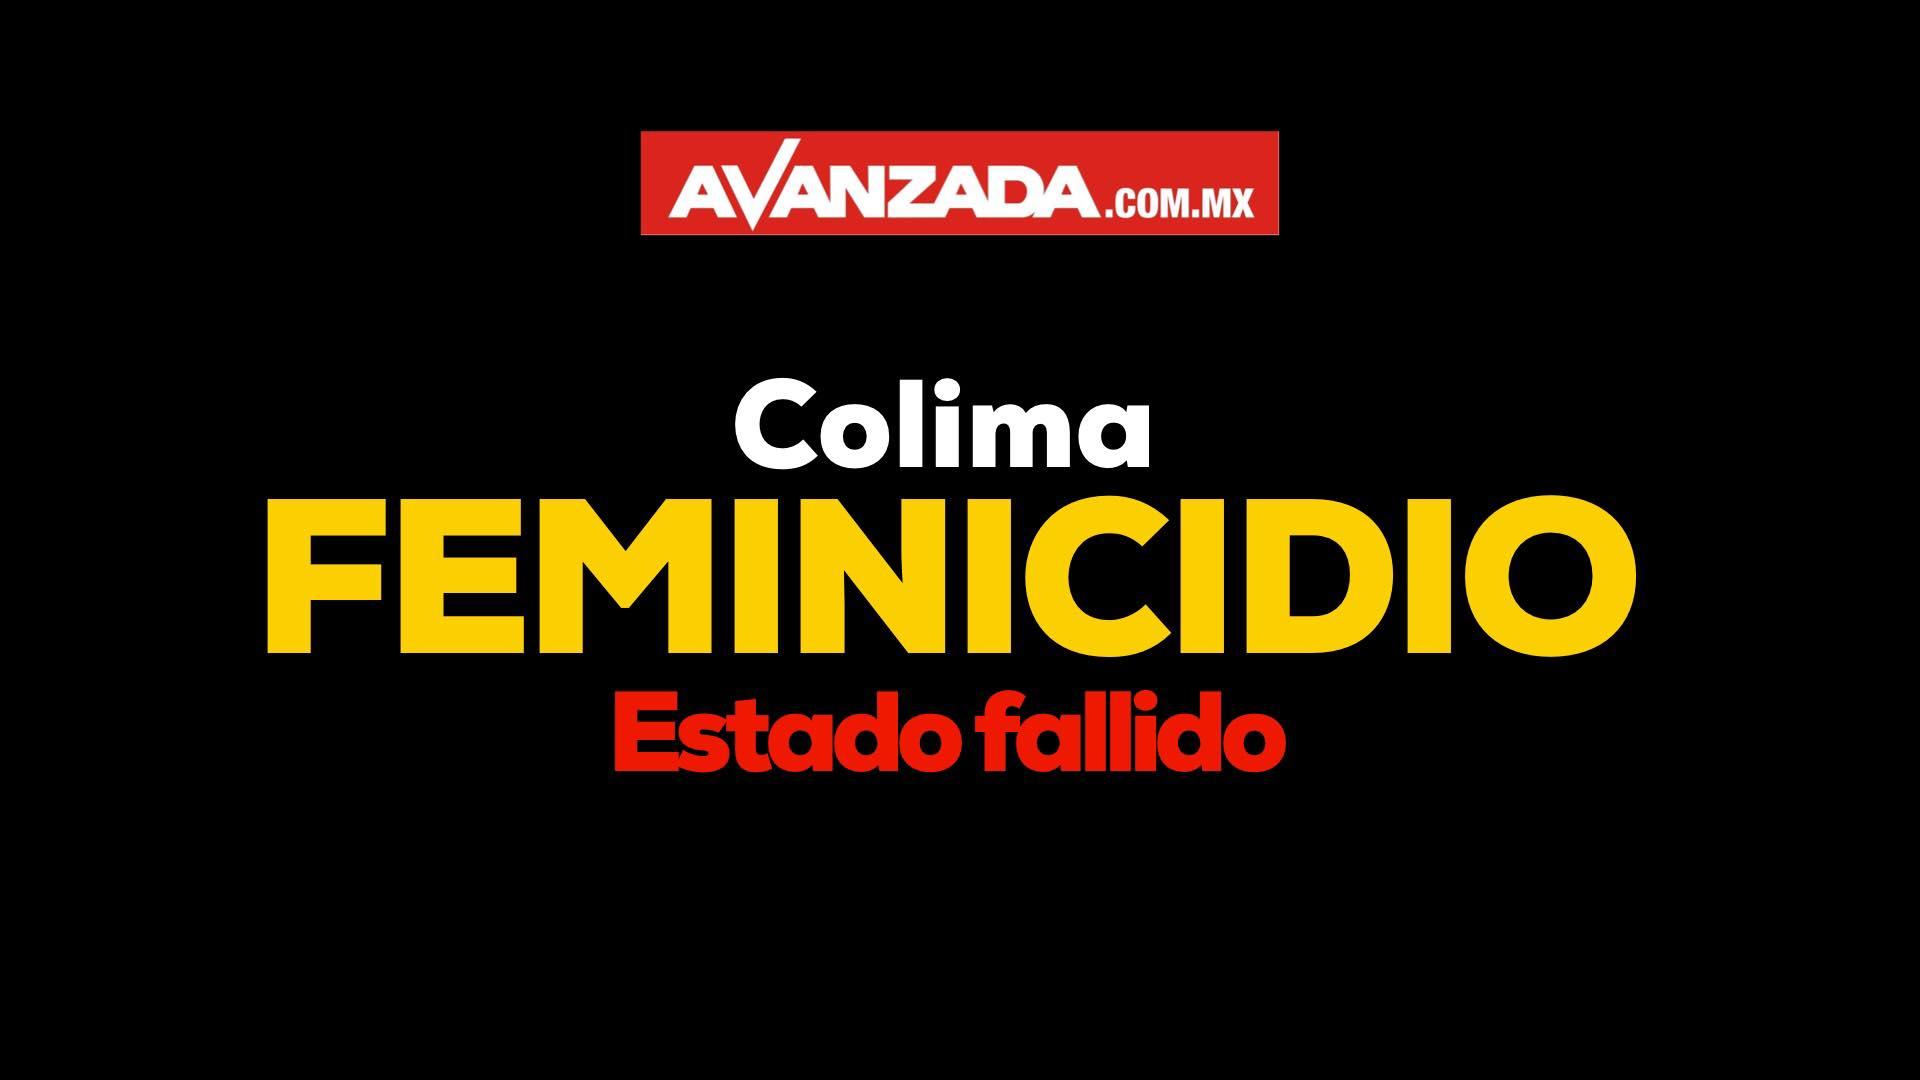 Colima primer lugar nacional en asesinato de mujeres